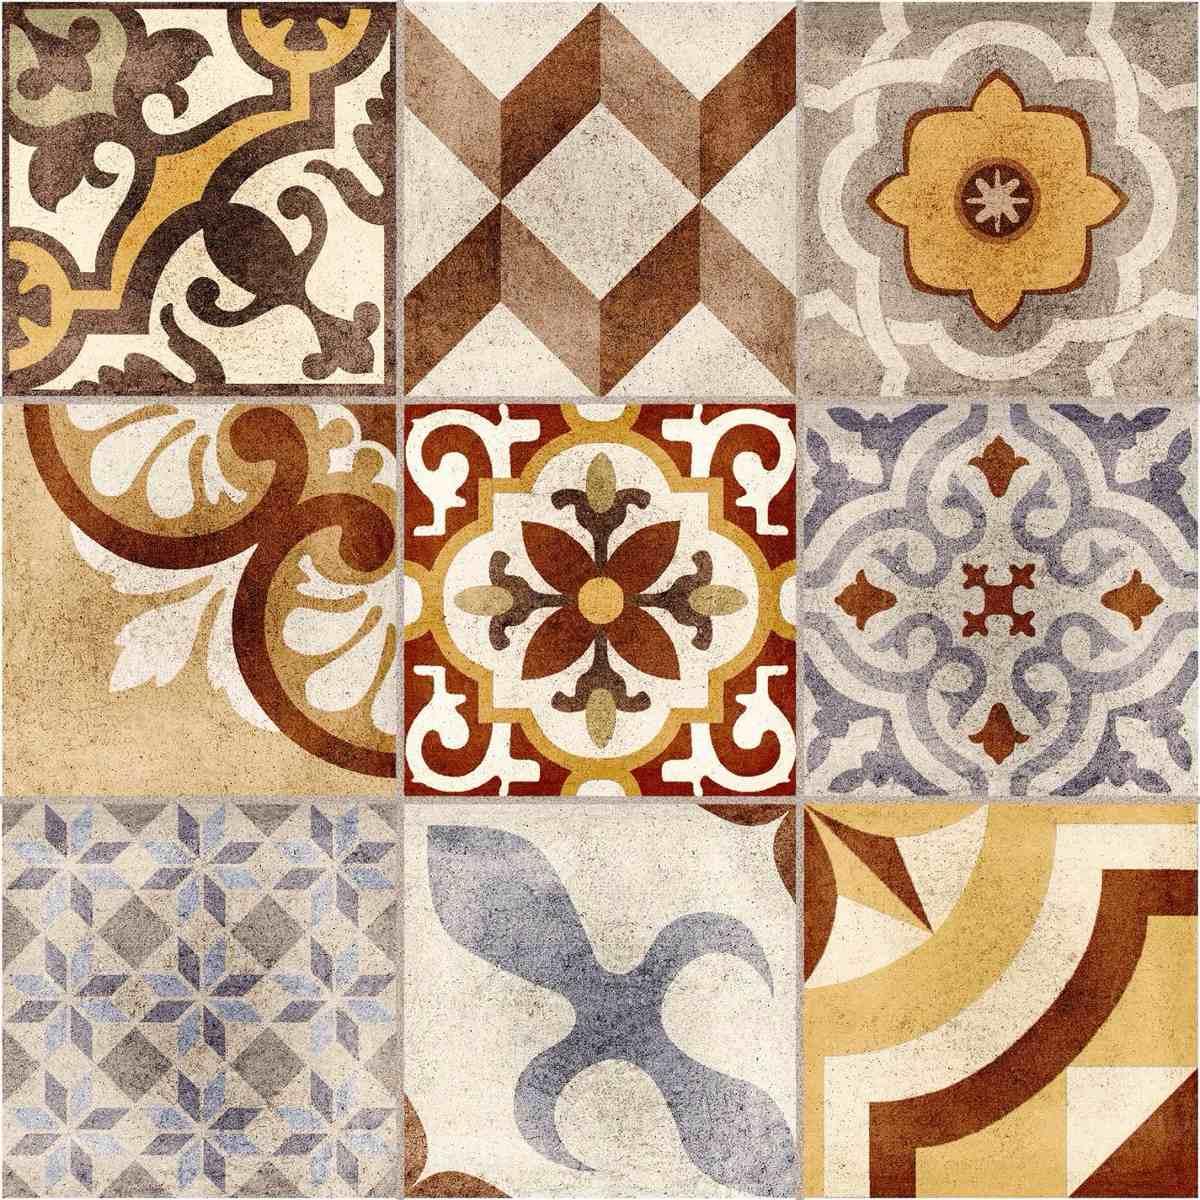 Piso porcelanato patchwork hd 60x60 modelo mosaico for Mosaicos para pisos precios